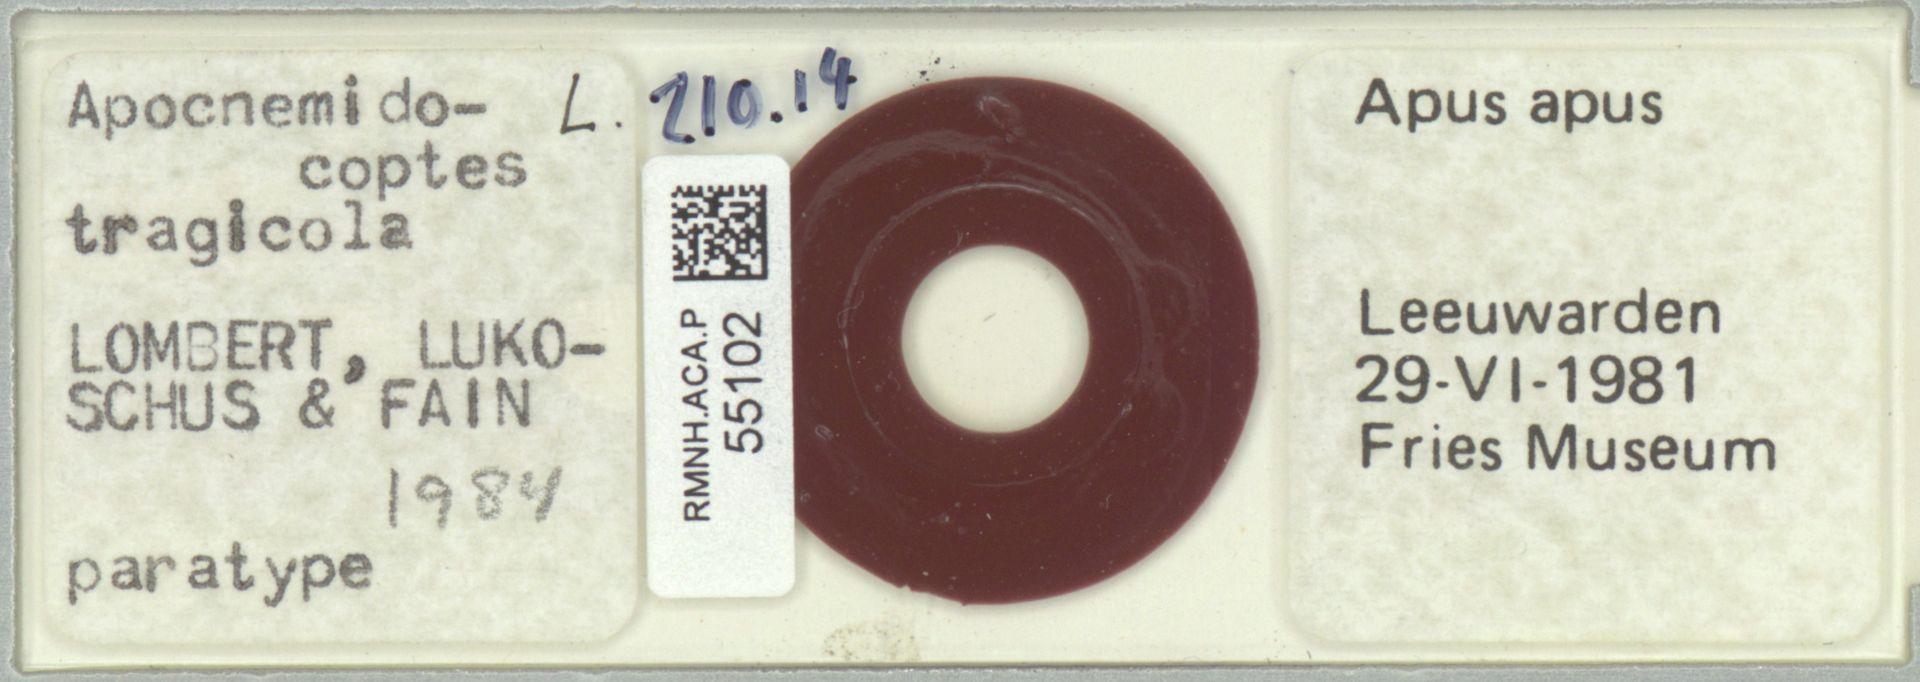 RMNH.ACA.P.55102 | Apocnemidocoptes tragicola Lombert, Lukoschus & Fain, 1984